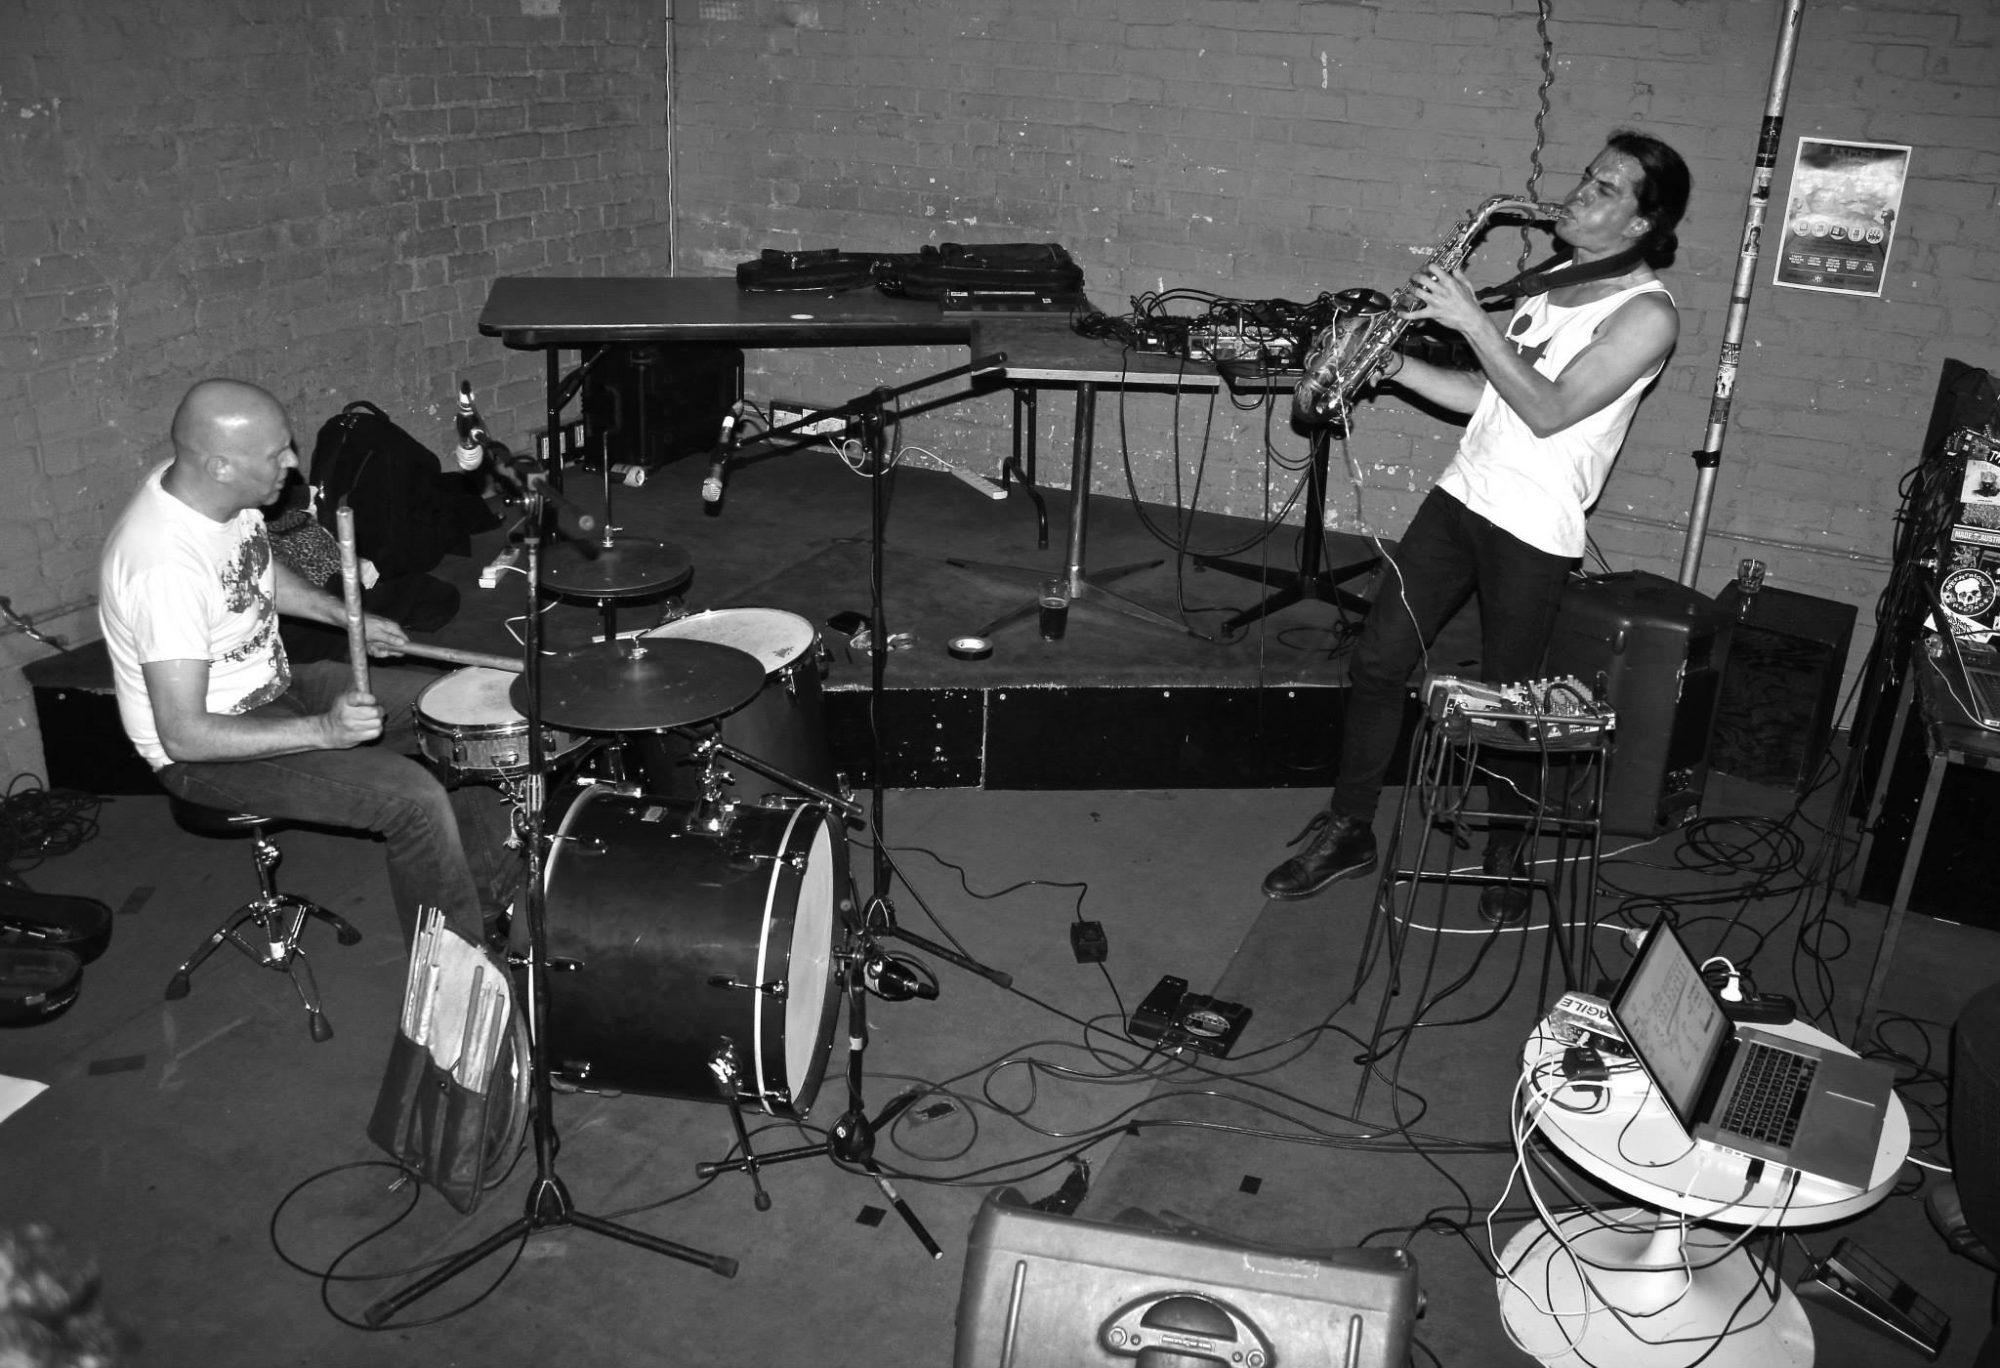 Sean Baxter + Lloyd Honeybrook + Scott Sinclair – Melbourne, Australia – 2015